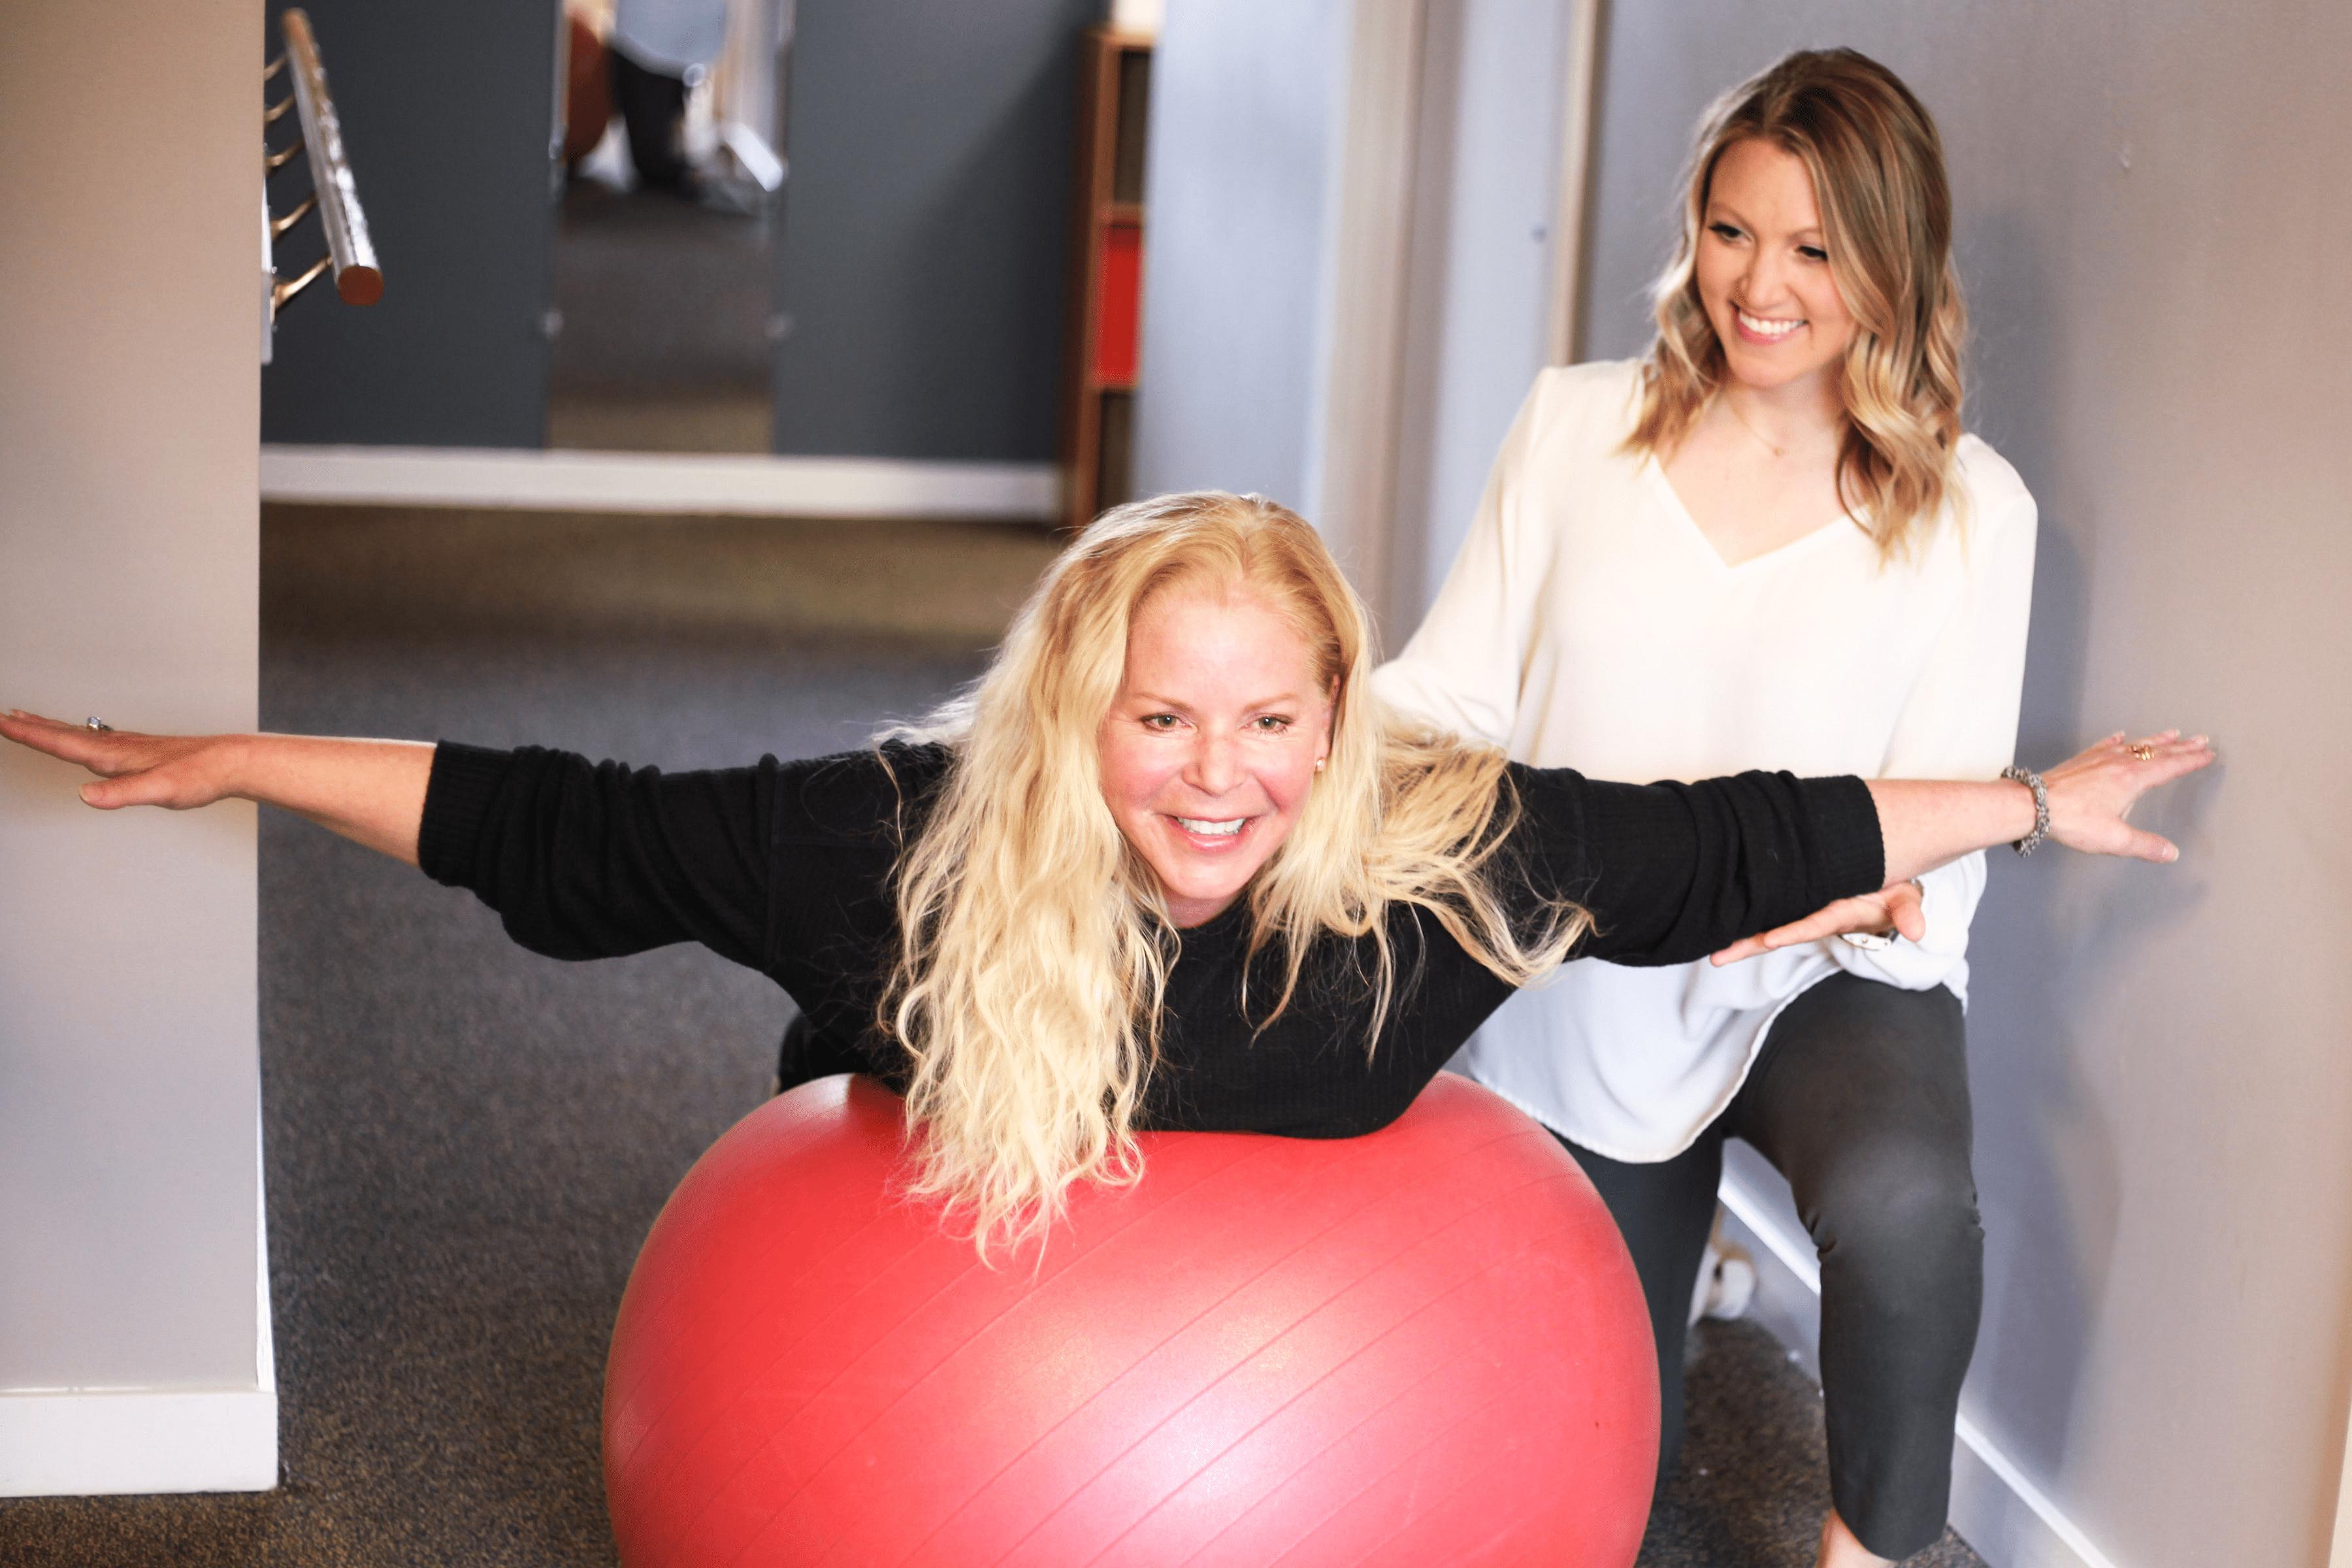 A woman balancing on a ball.